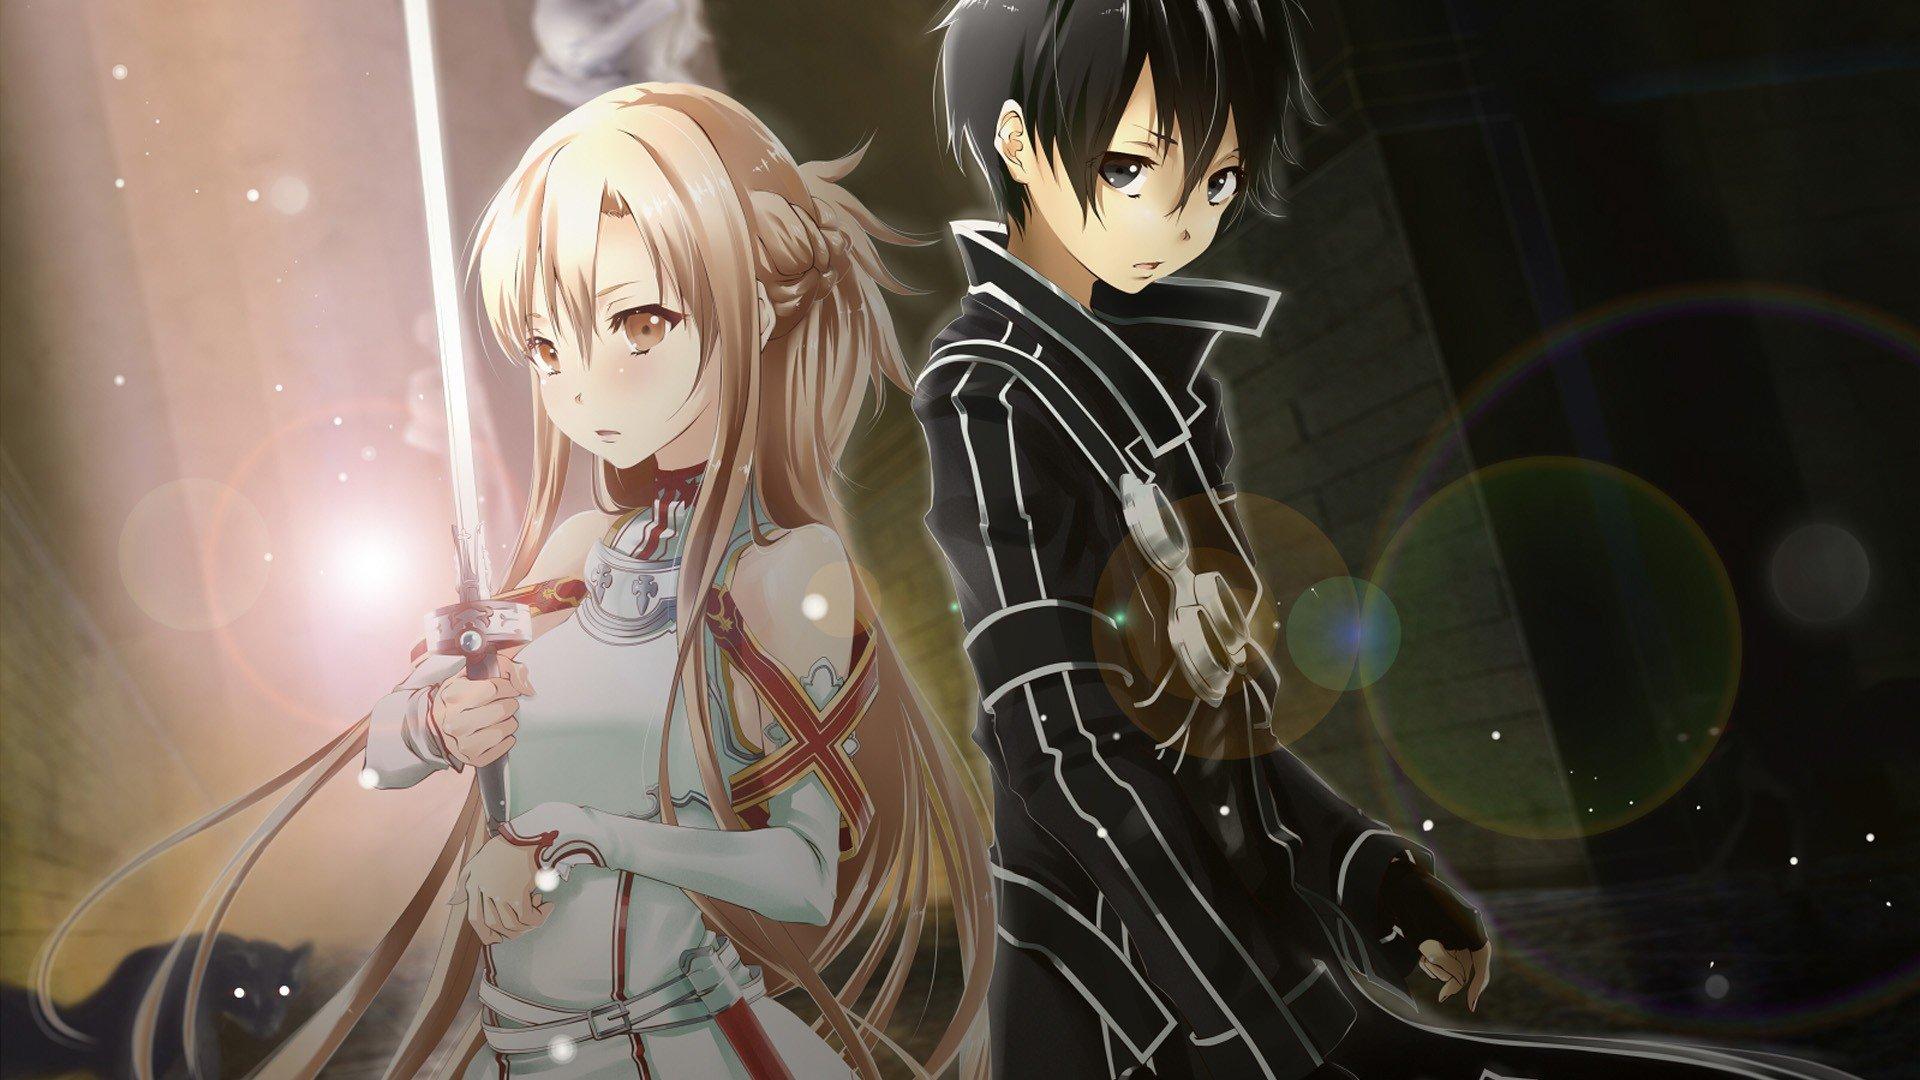 Sword Art Online Yuuki Asuna Kirigaya Kazuto Kirito Wallpaper